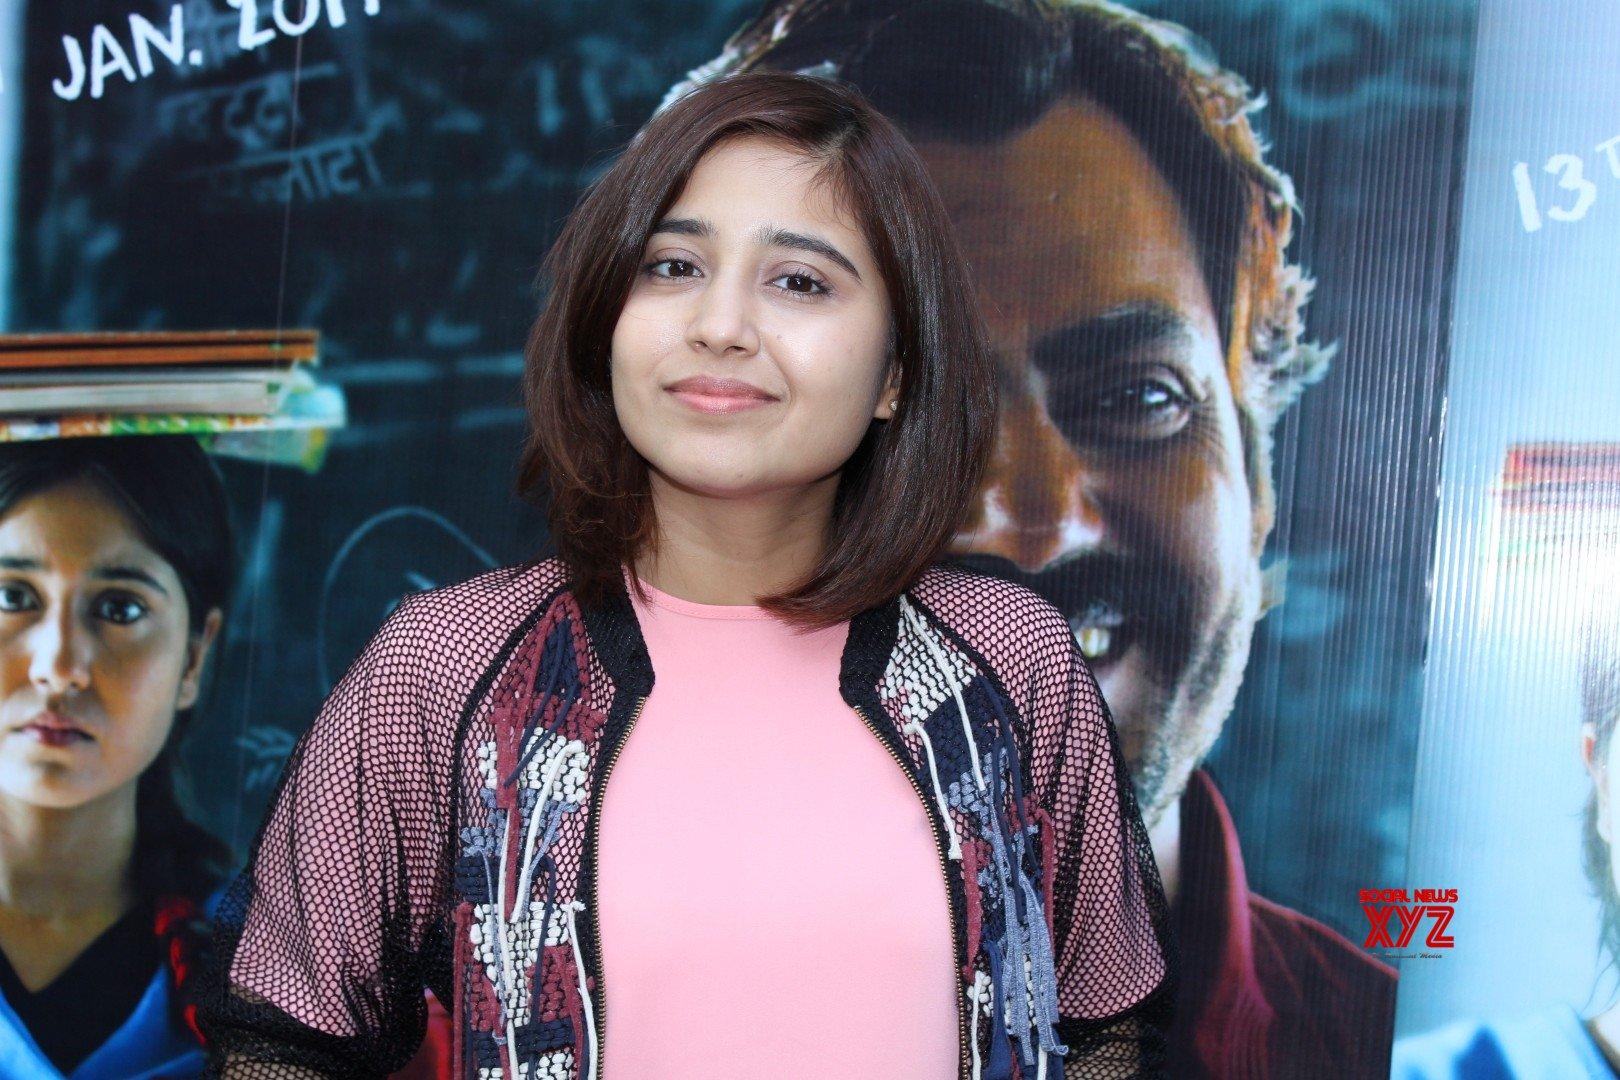 Shweta Tripathi Sharma's '5 years of craziness'